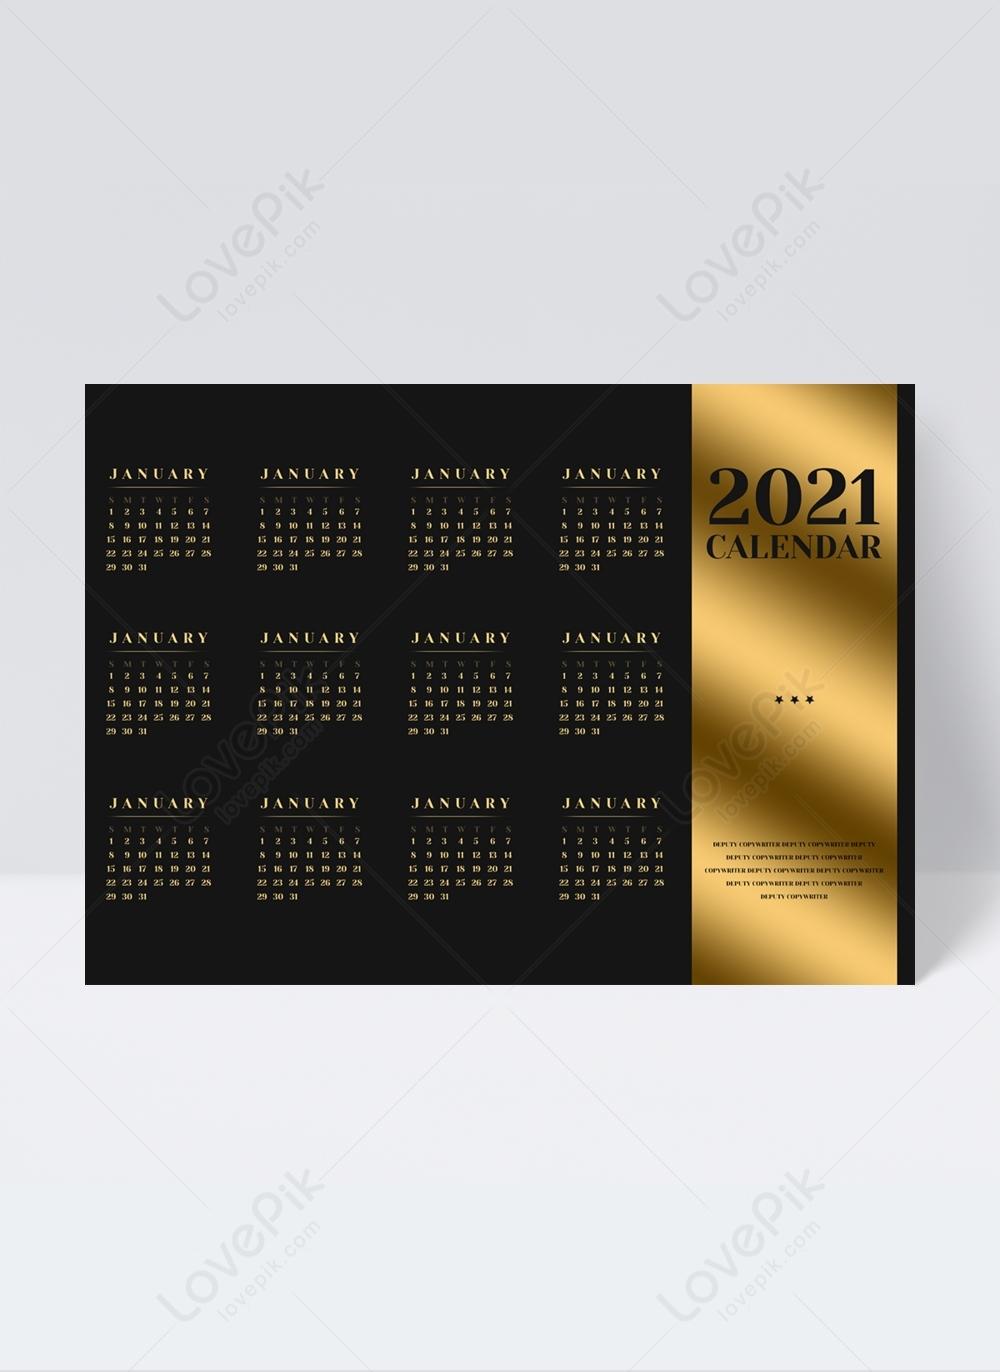 Luxury Classic Black And Gold Color Scheme 2021 Calendar Календарь Декабрь Схема2021